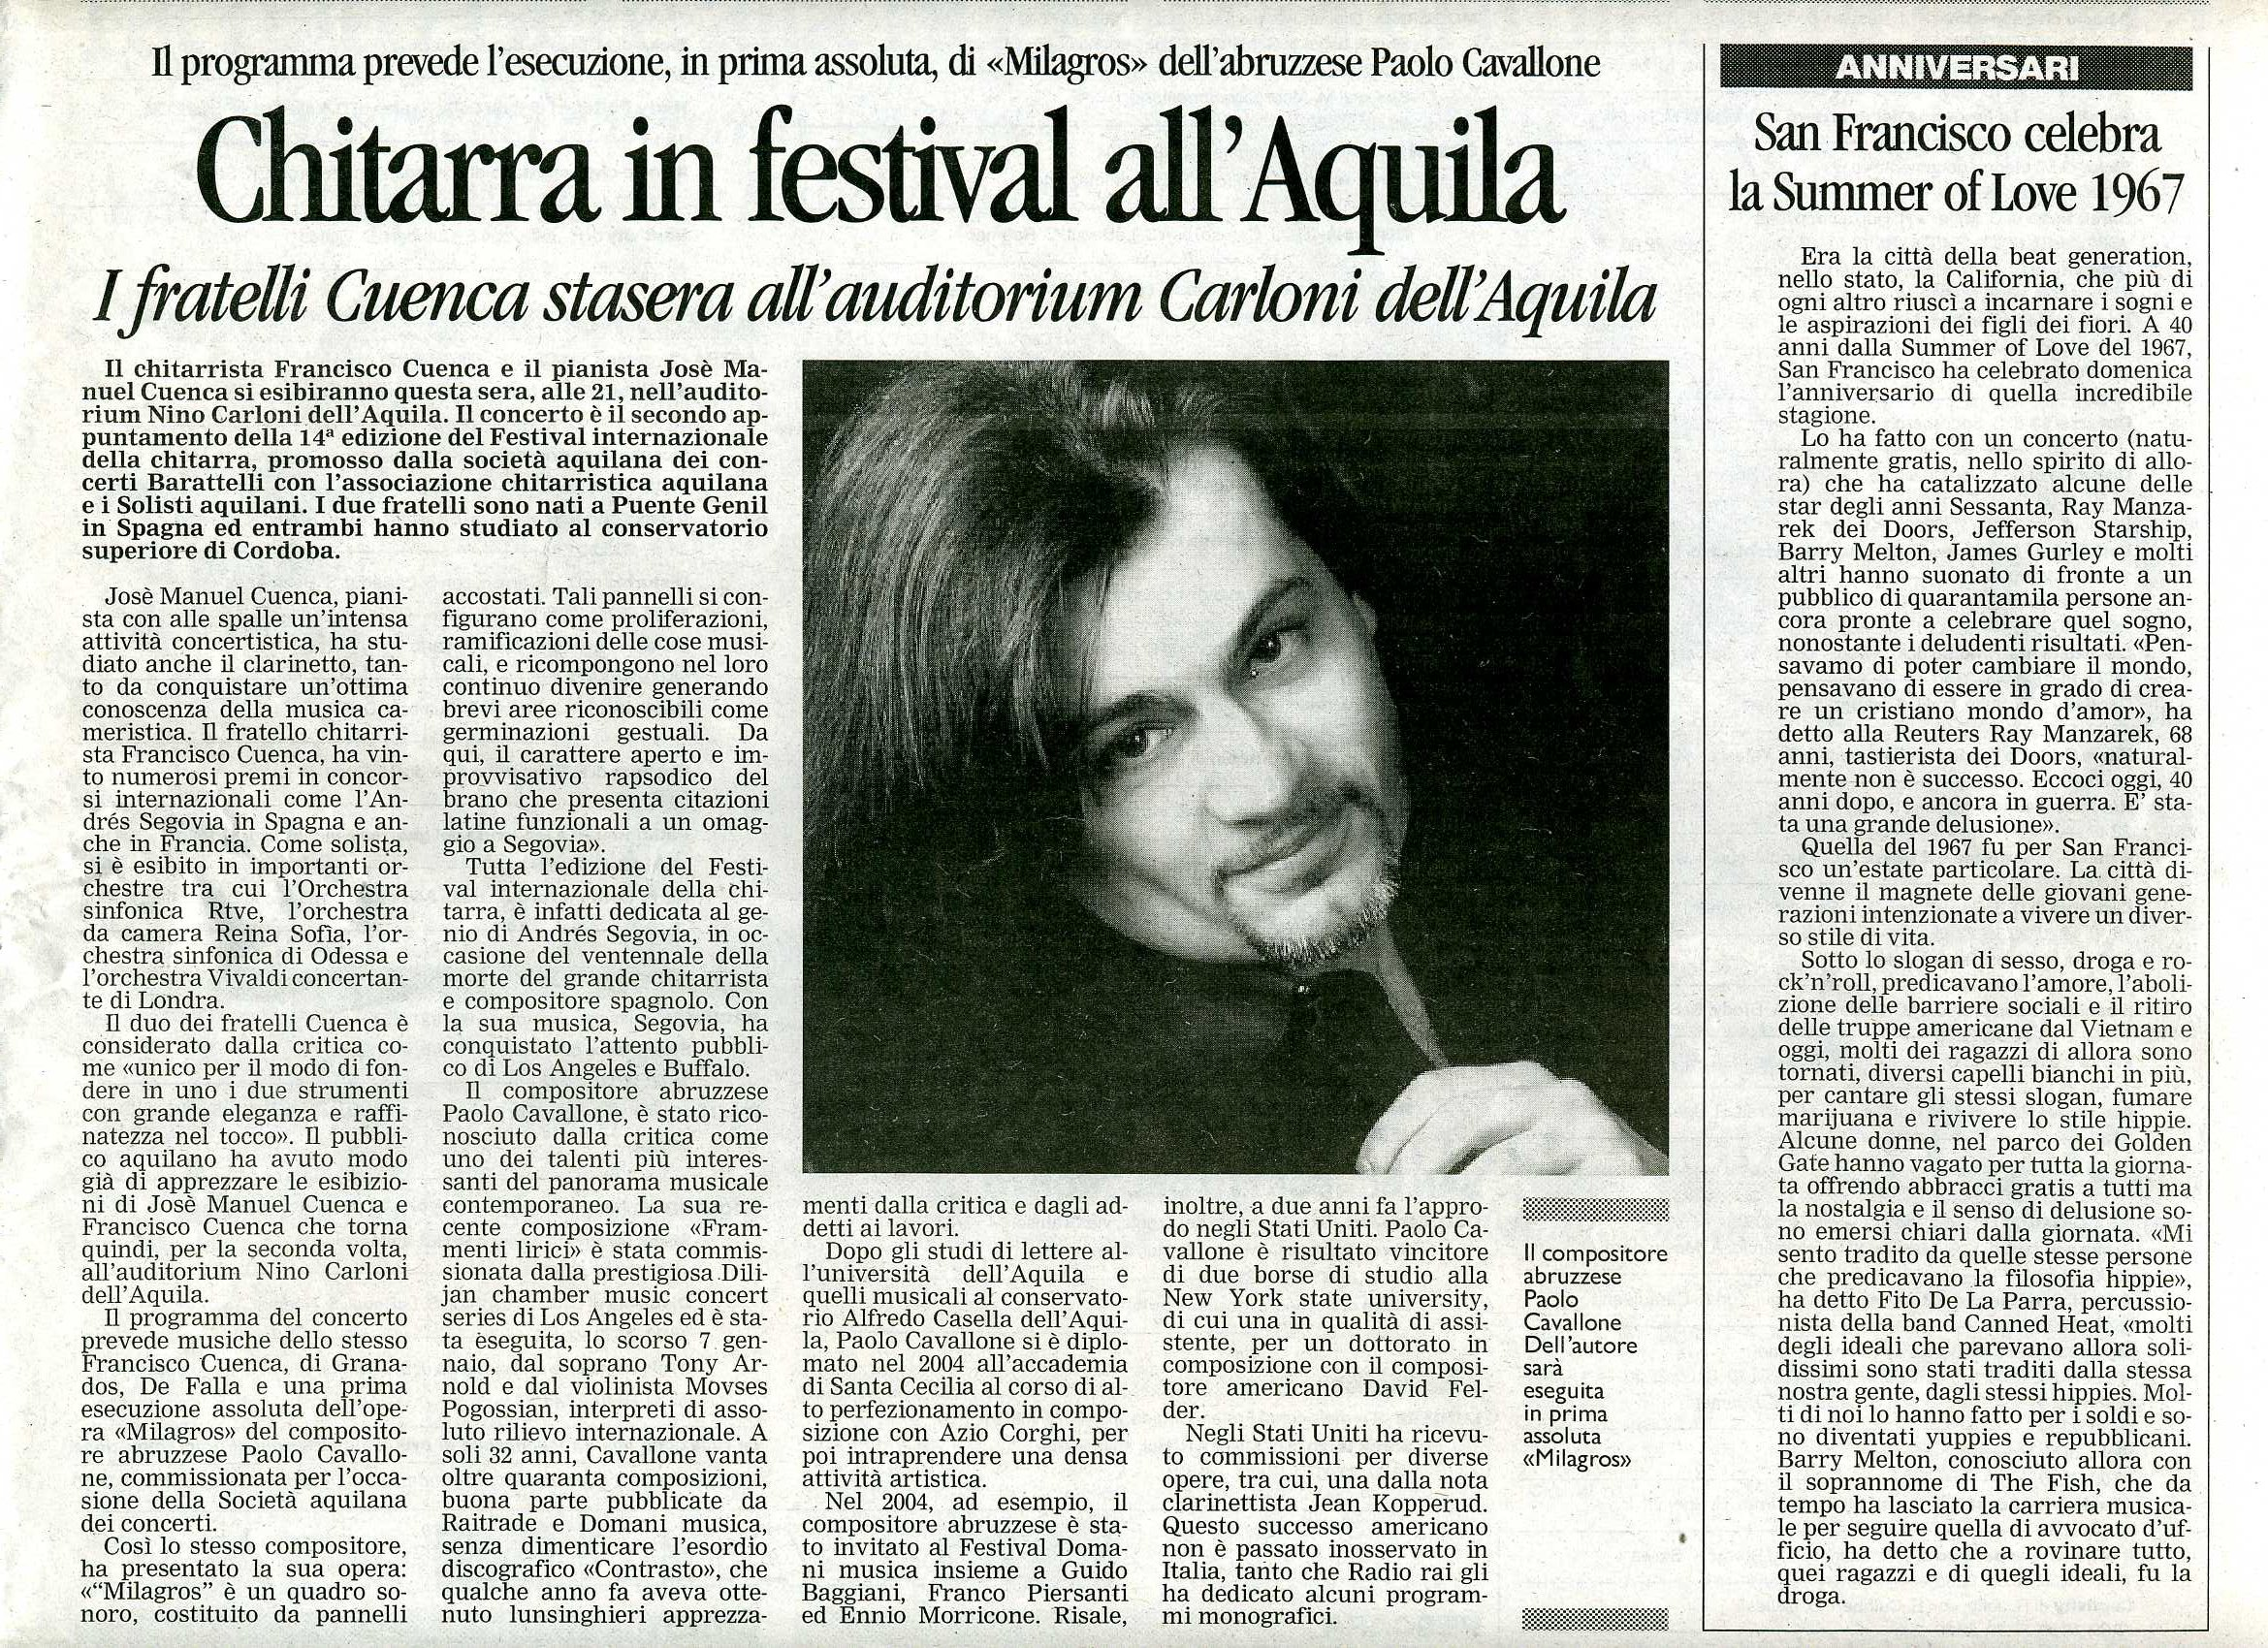 Milagros at L'Aquila's International Guitar Festival